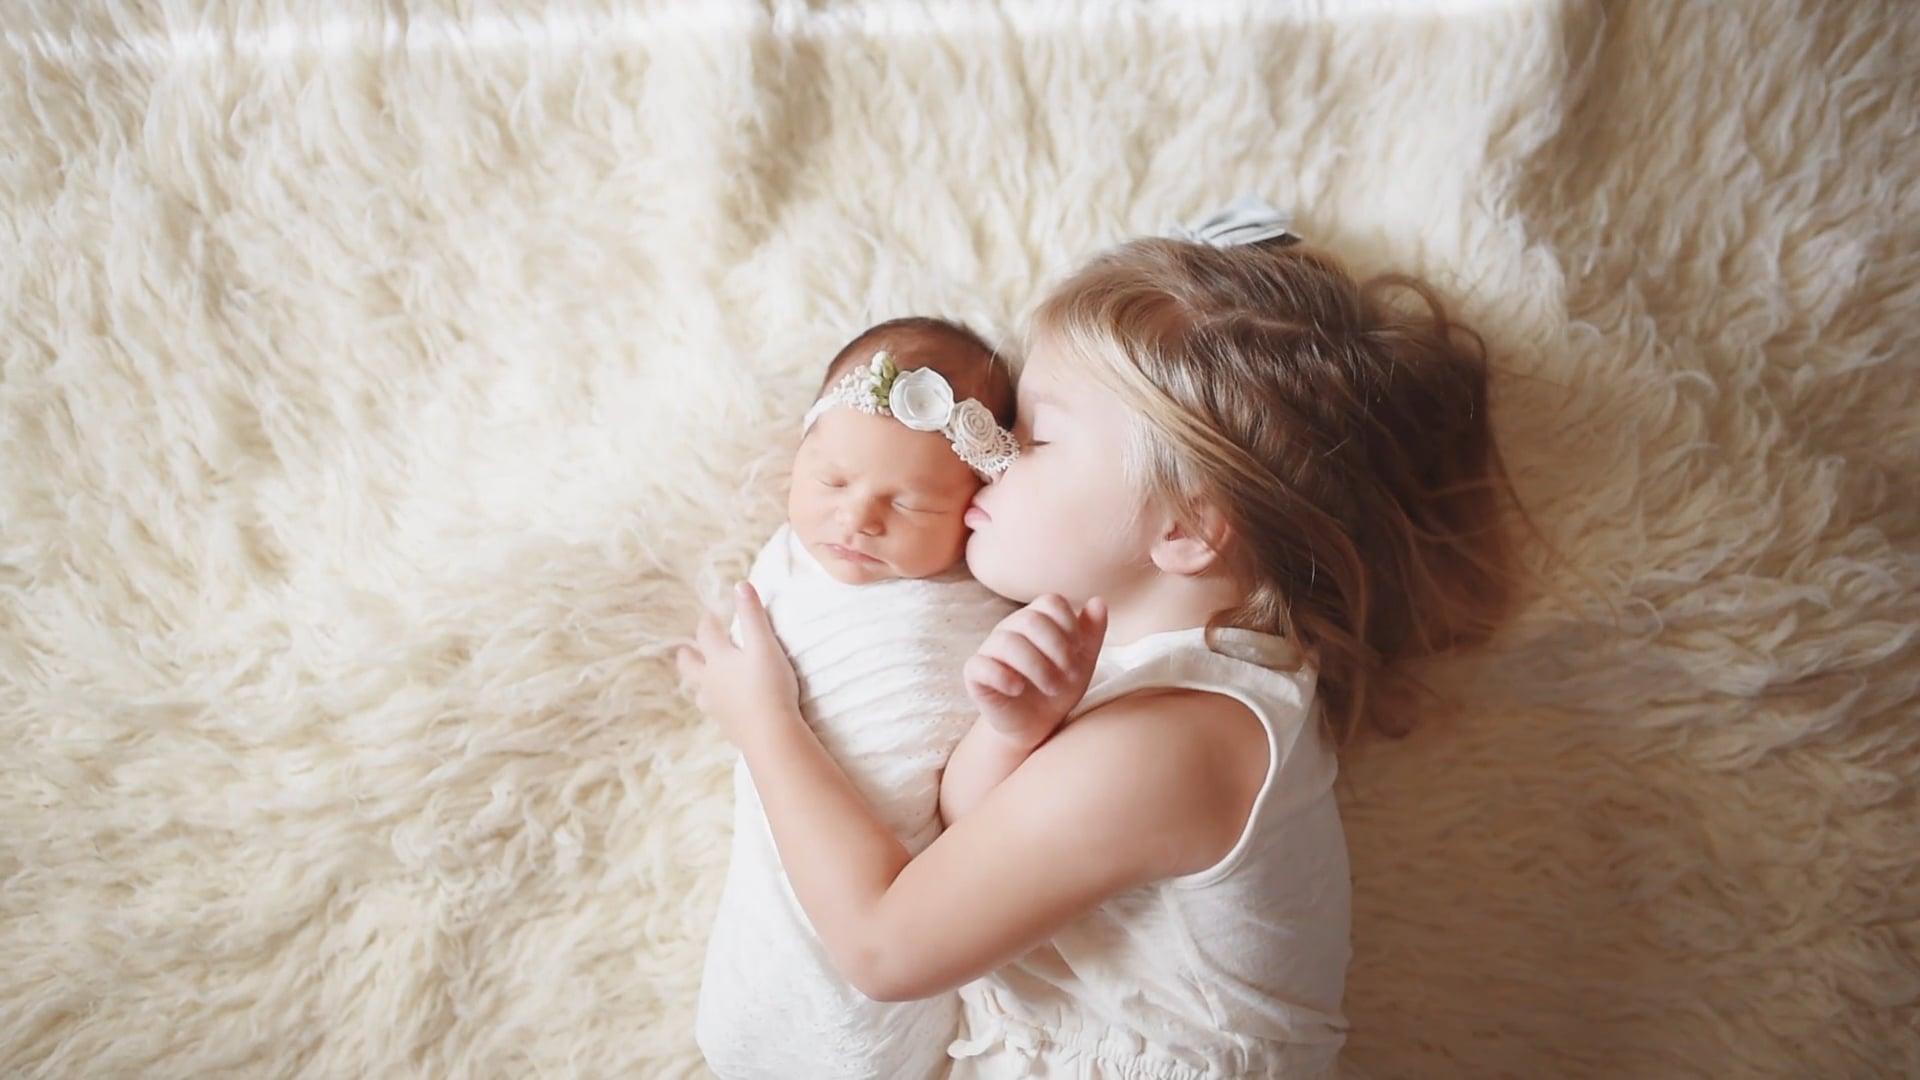 Rouse Family | Welcoming baby Adeline | Tulsa Oklahoma Videographer | Newborn Photographer